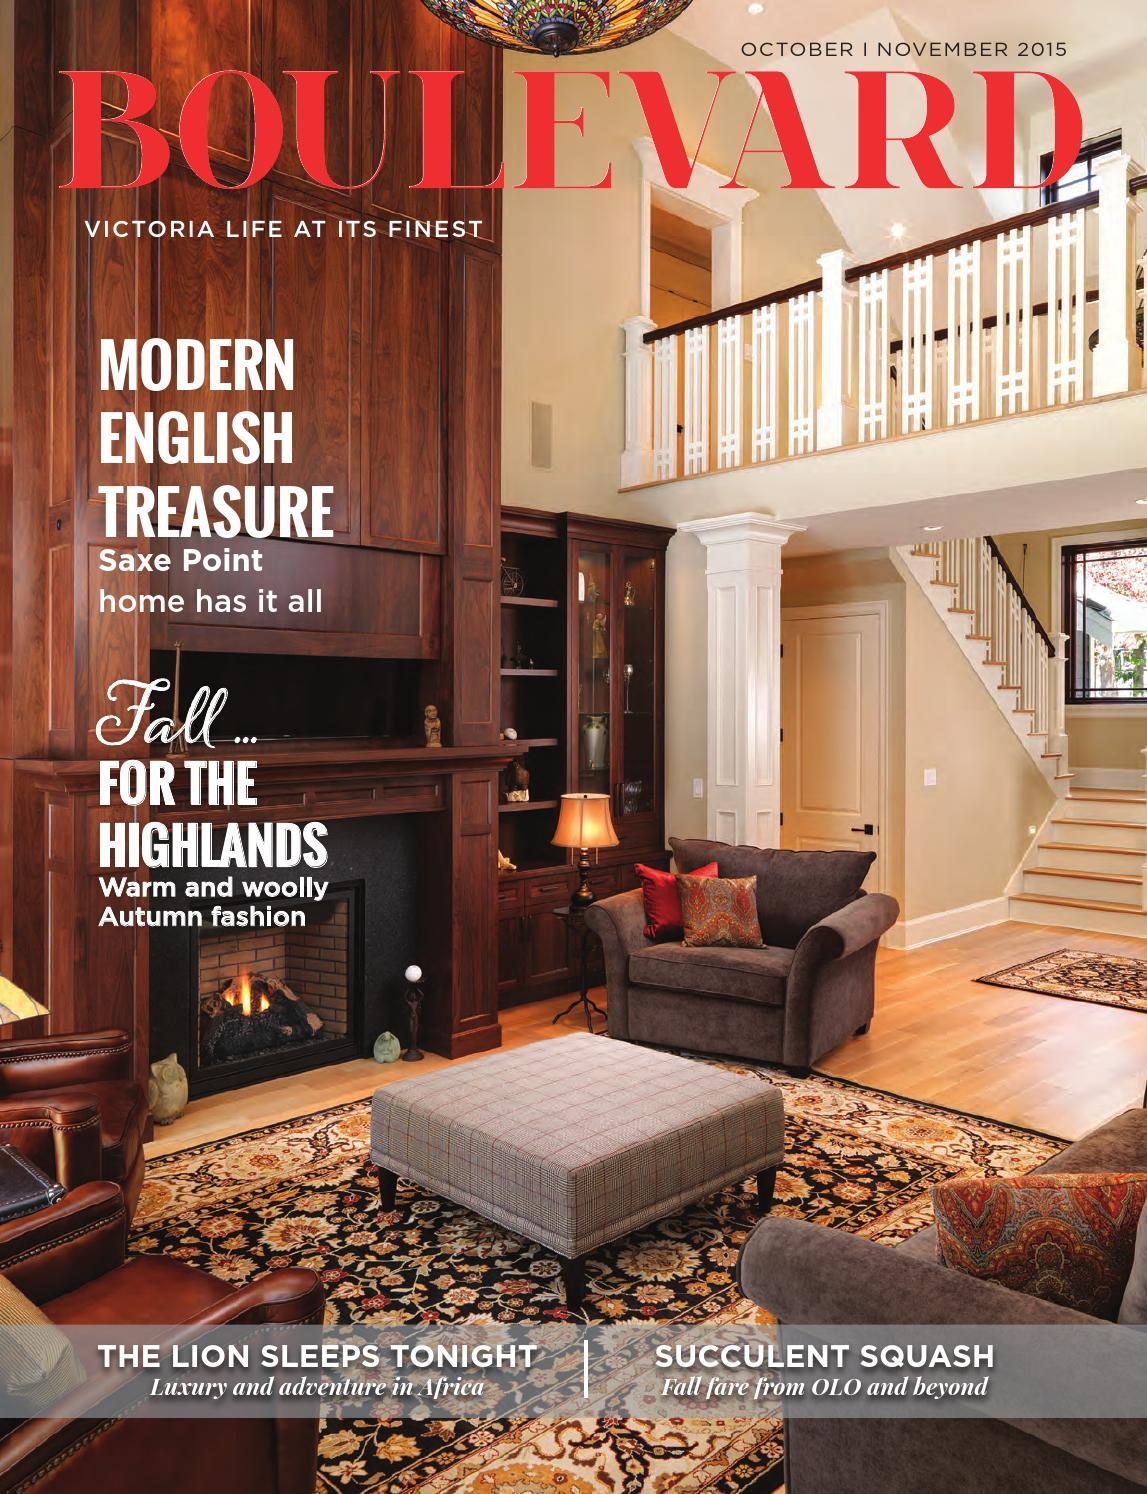 Boulevard Magazine October November 2015 Issue By Boulevard